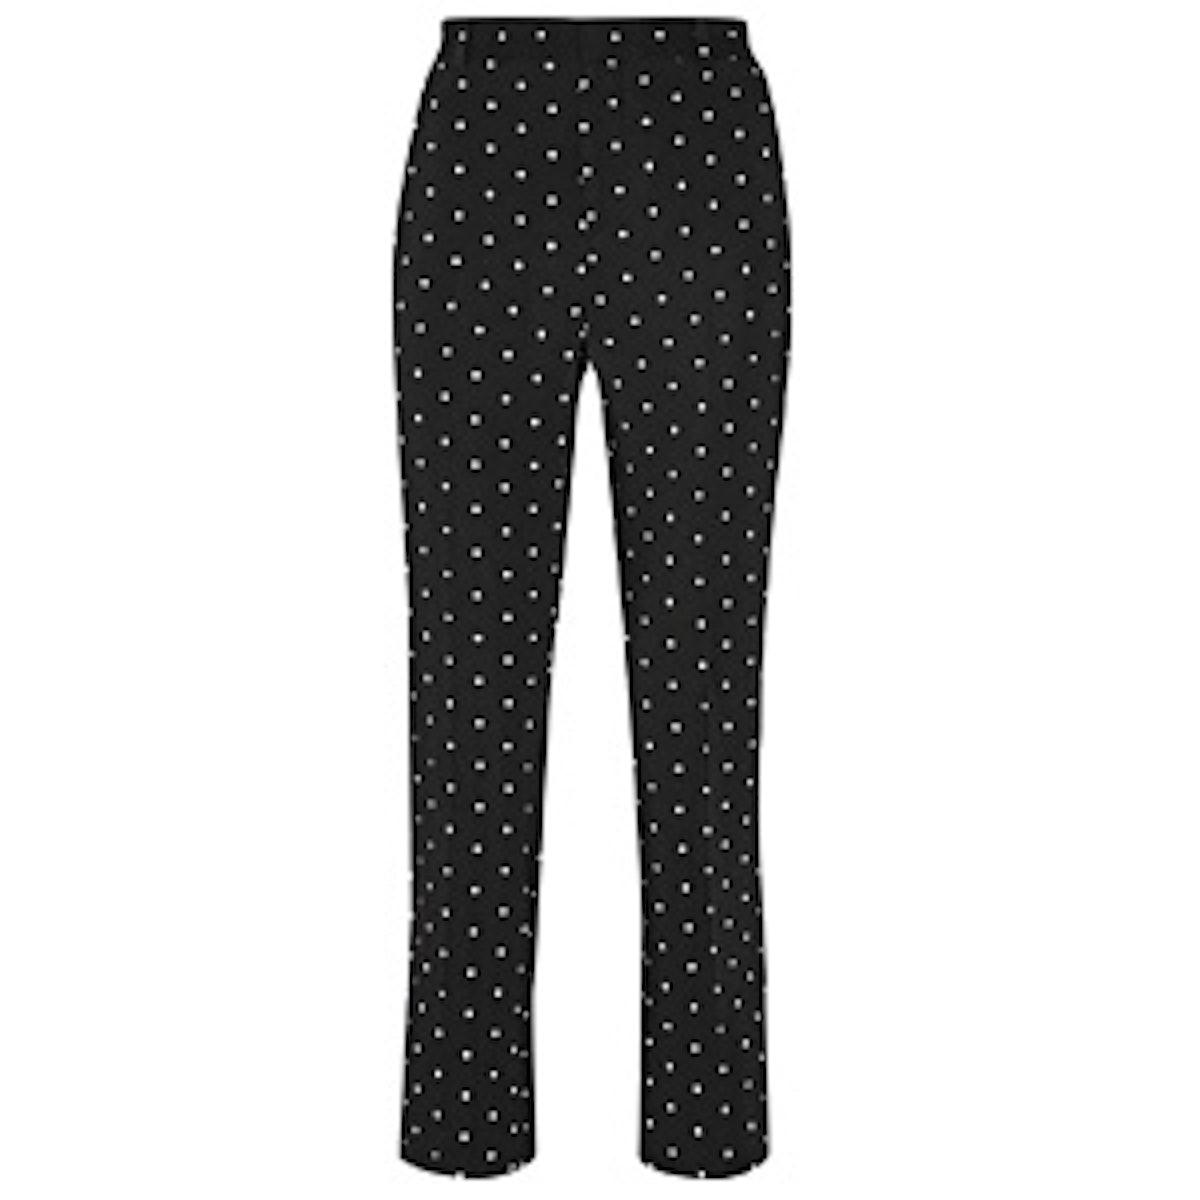 Pants In Cross-Print Black Cady